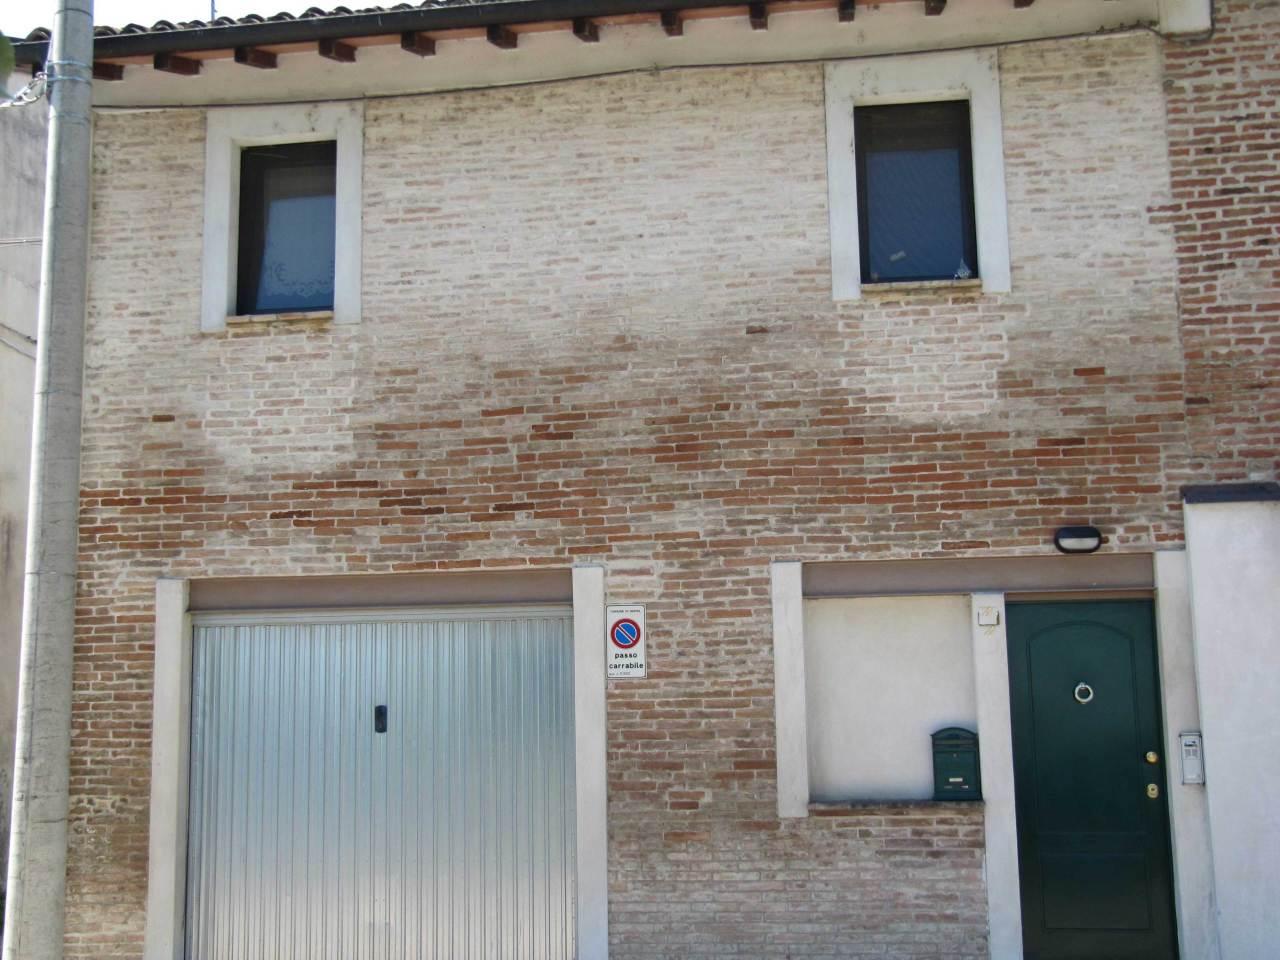 Bilocale Parma Via Case Vecchie 11